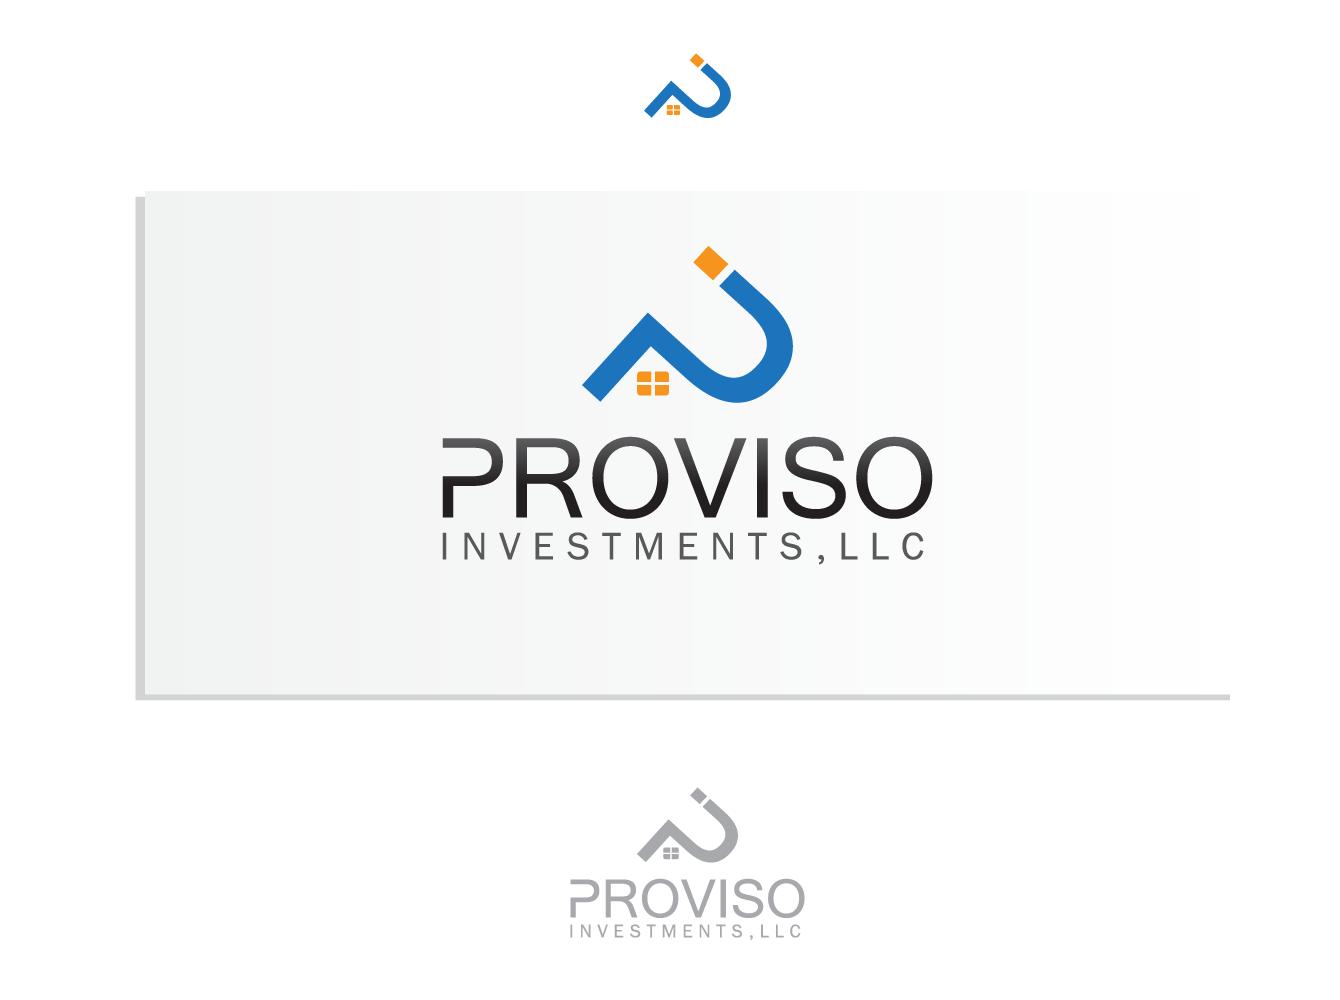 Logo Design by Andi Muhtasyam - Entry No. 53 in the Logo Design Contest New Logo Design for PROVISO INVESTMENTS,LLC.